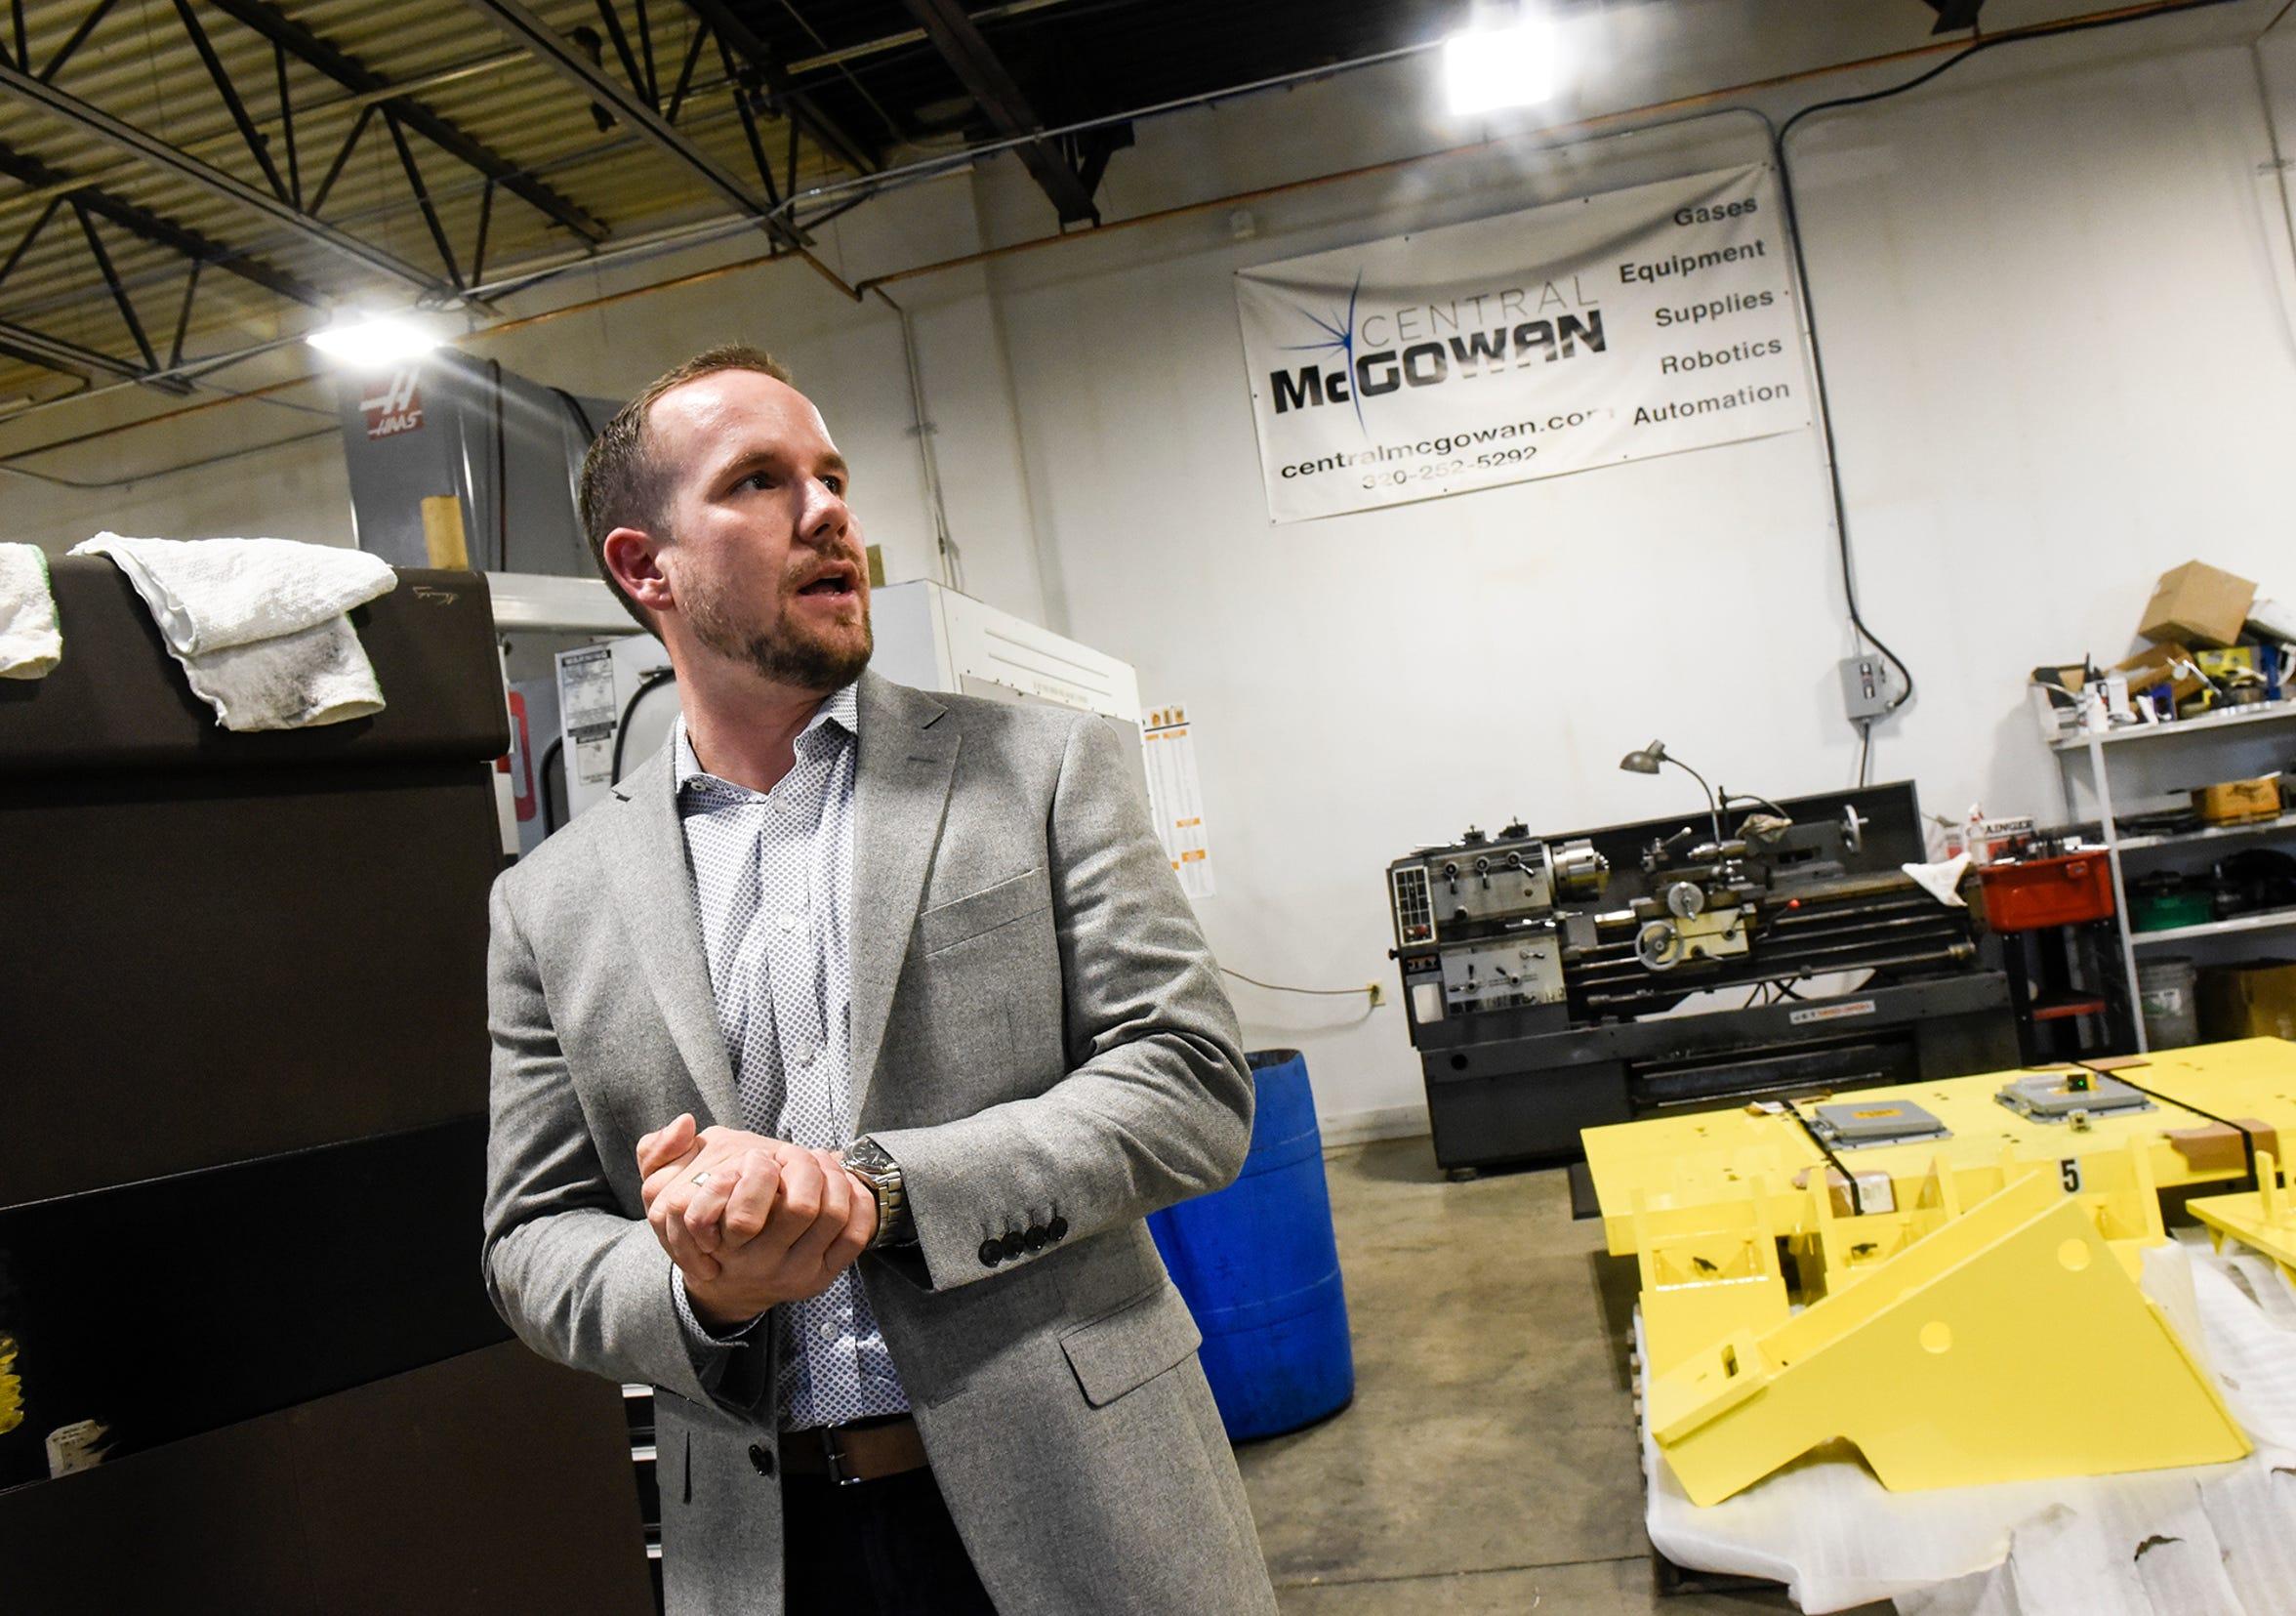 Central McGowan President and CEO Joe Francis talks about the company's robotics program Thursday, Dec. 6, in St. Cloud.